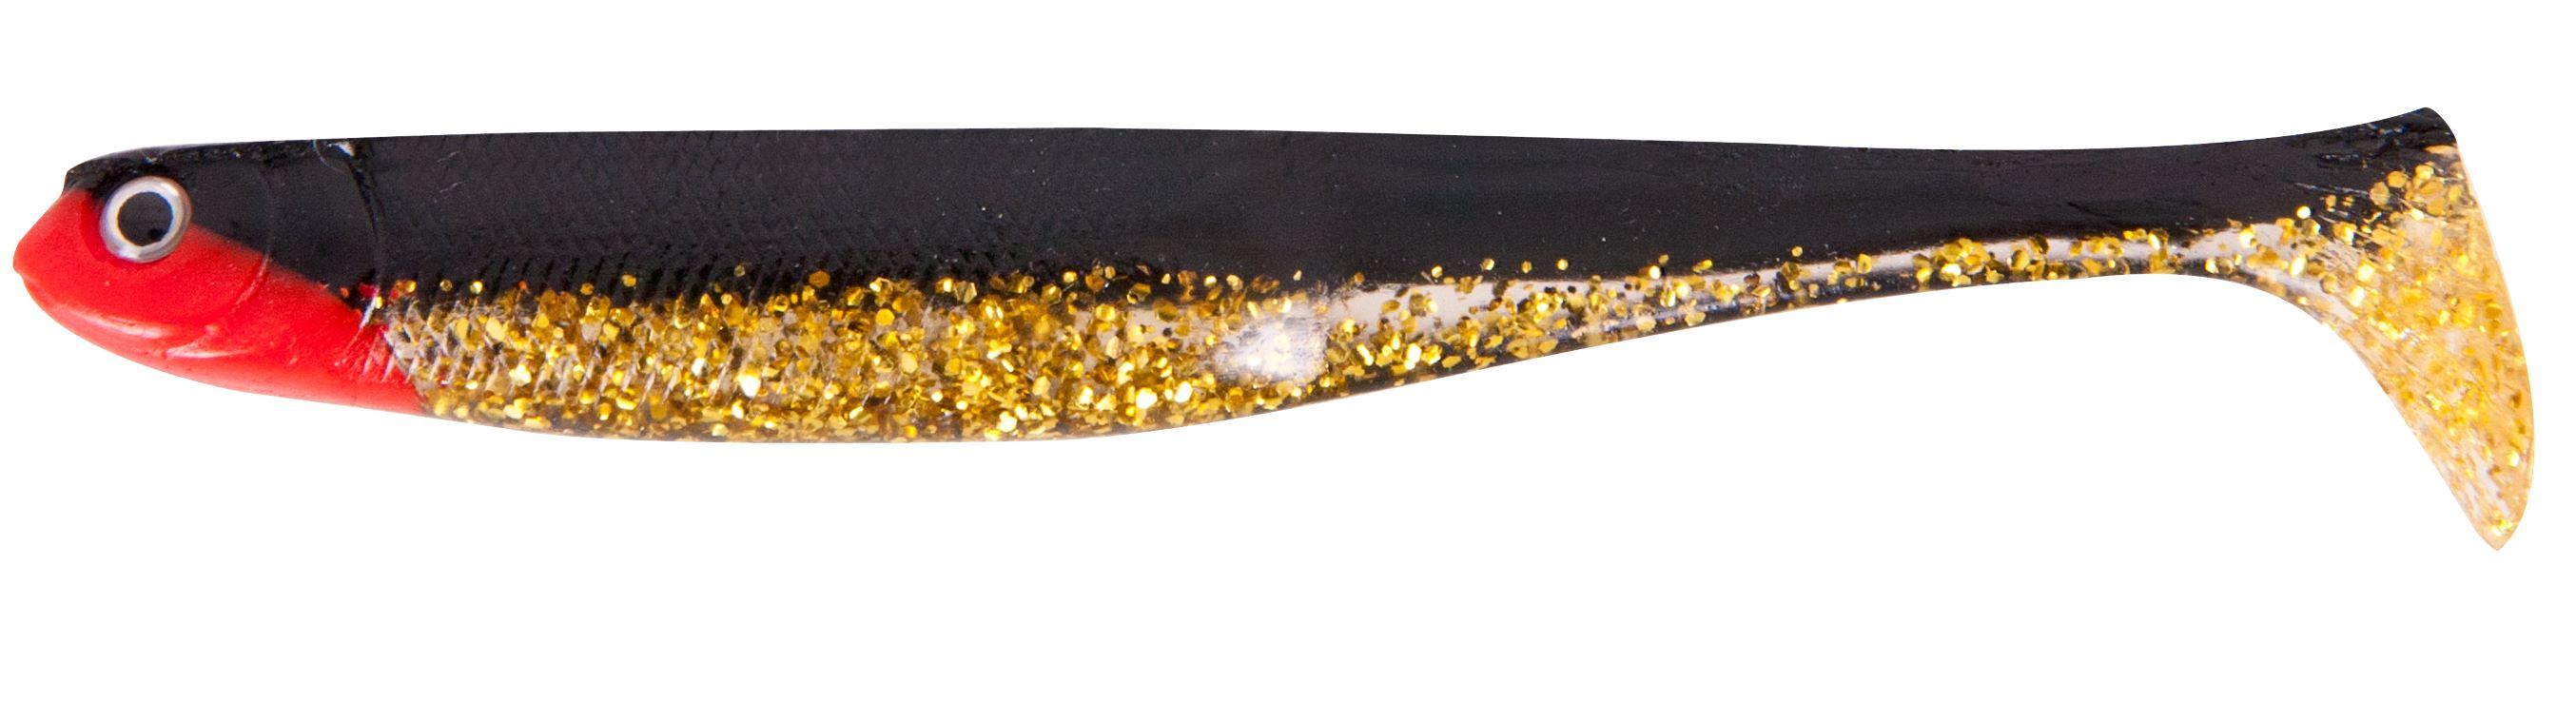 Iron Claw gumová nástraha Slim Jim 13 cm Vzor RM, 3 ks